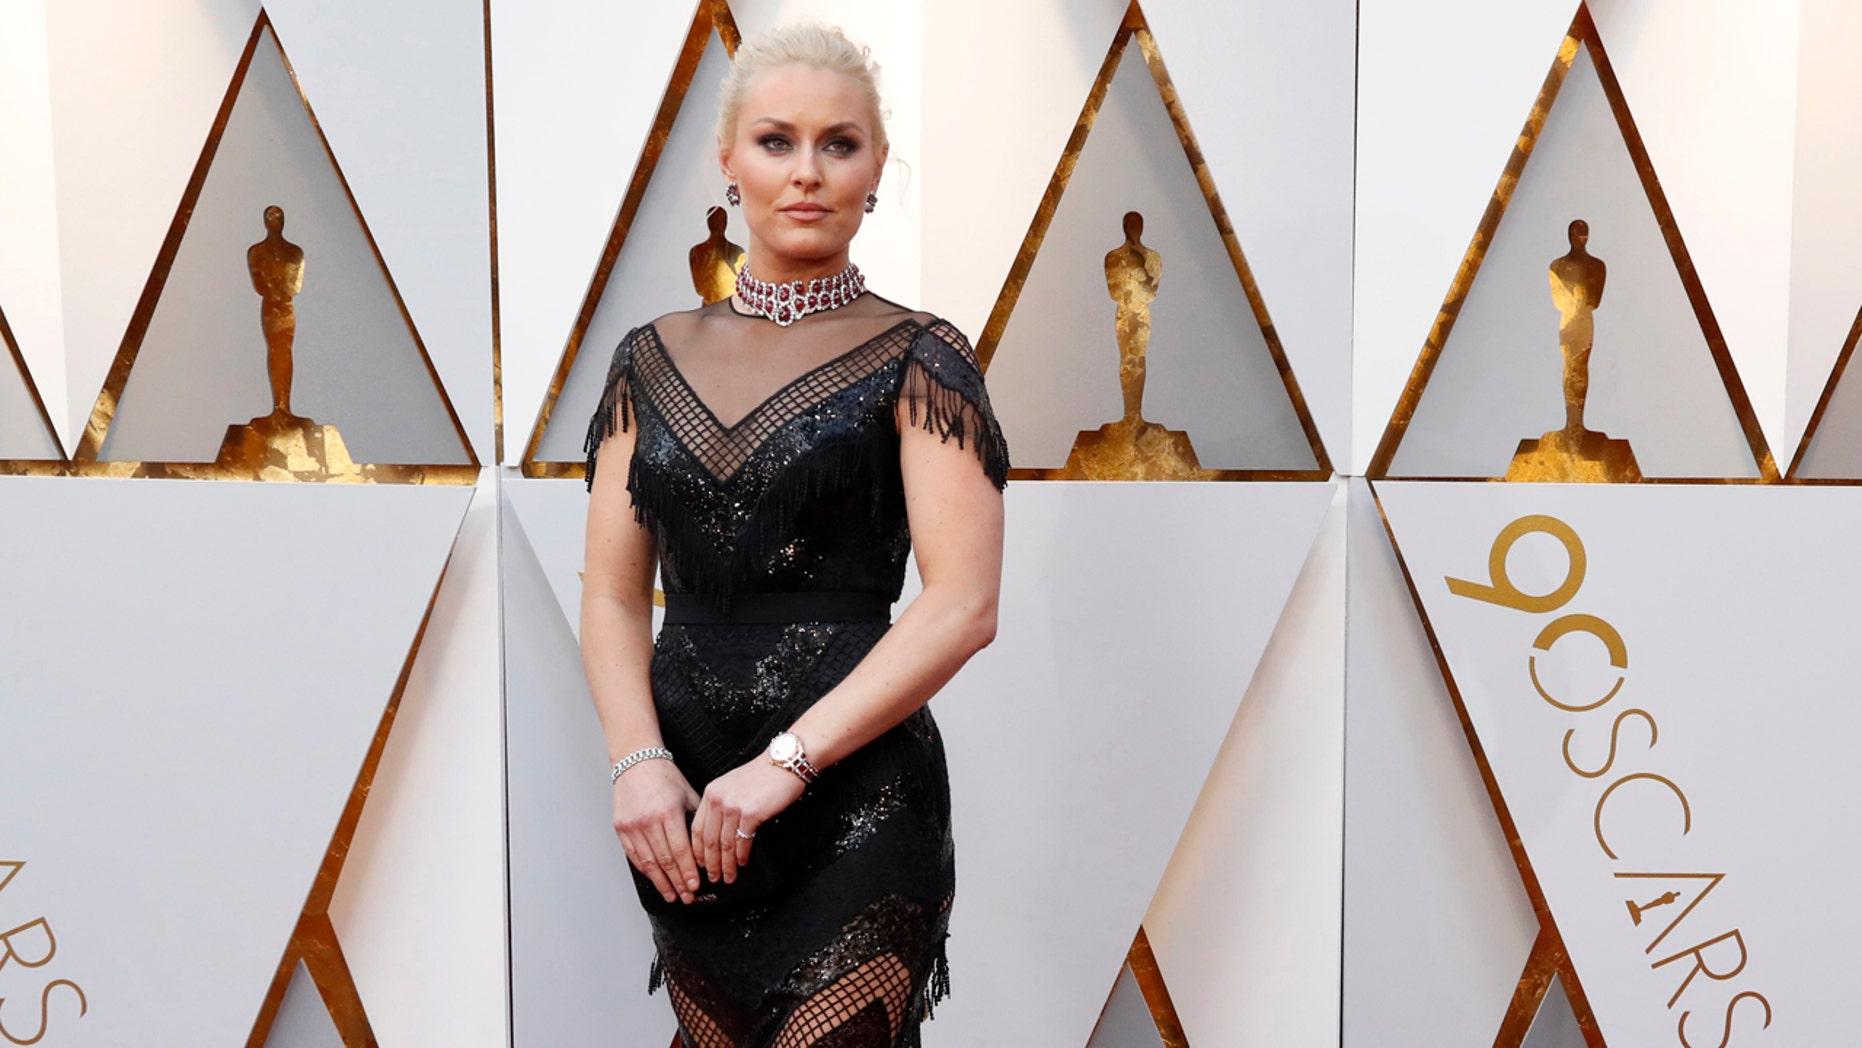 Skier Lindsey Vonn wears Christian Siriano on the Oscars red carpet.